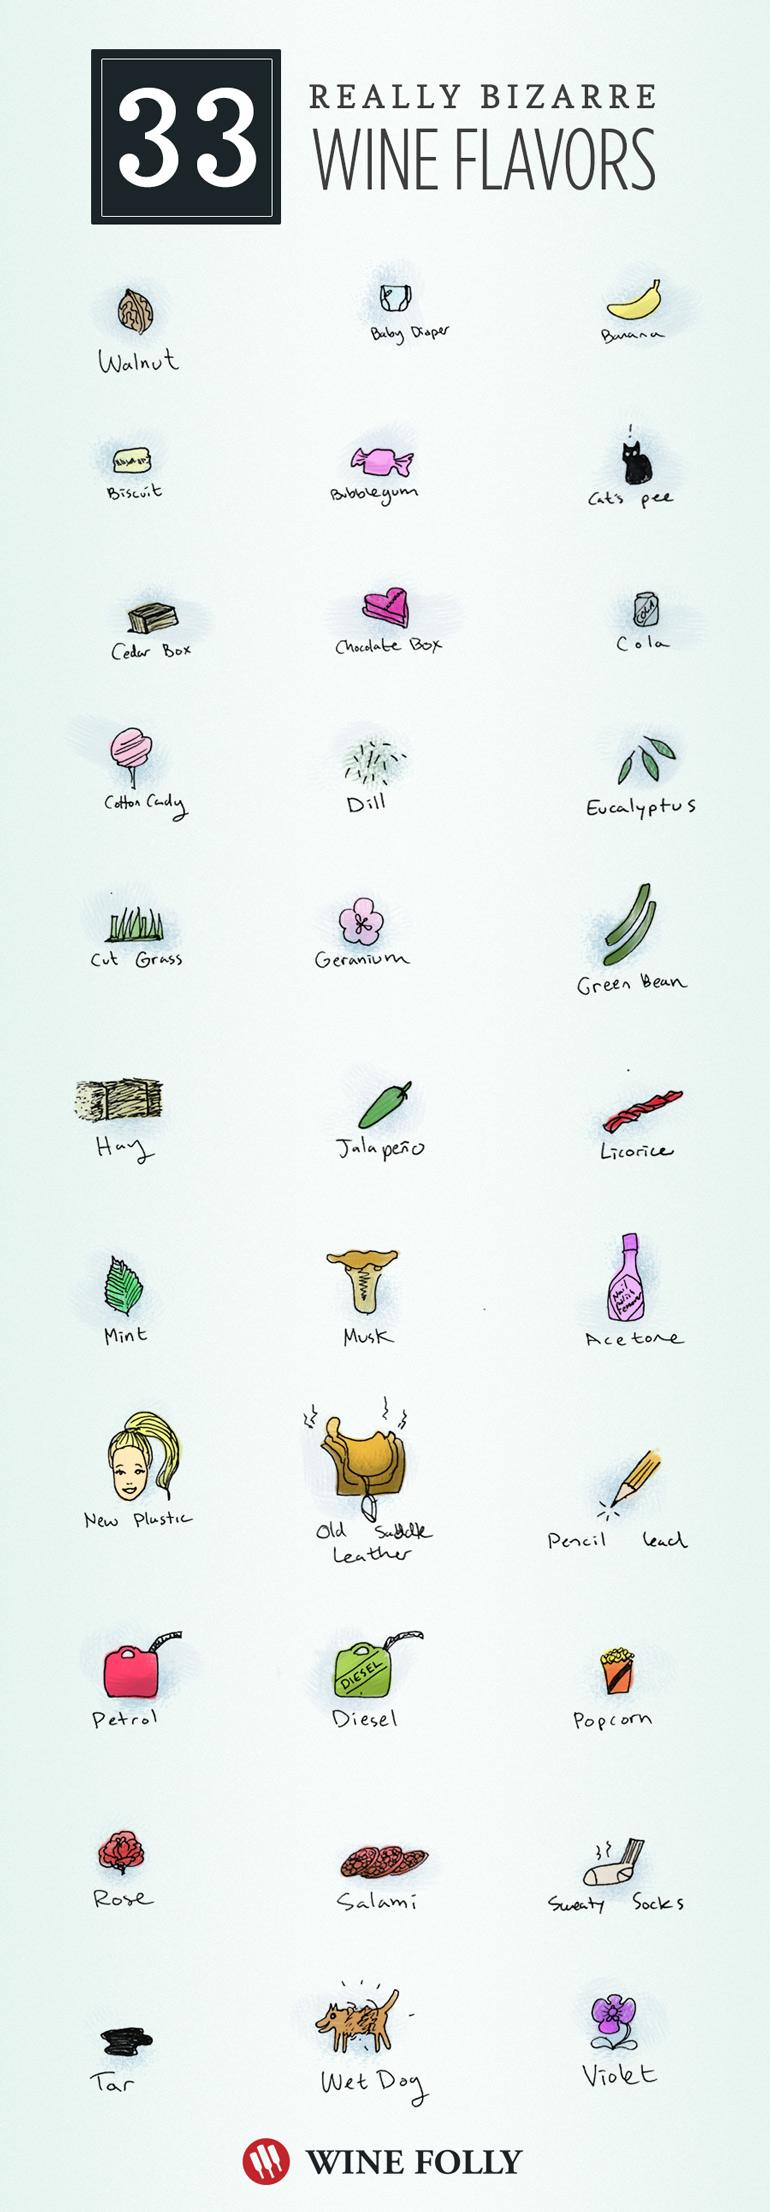 33 Bizarre Wine Flavors